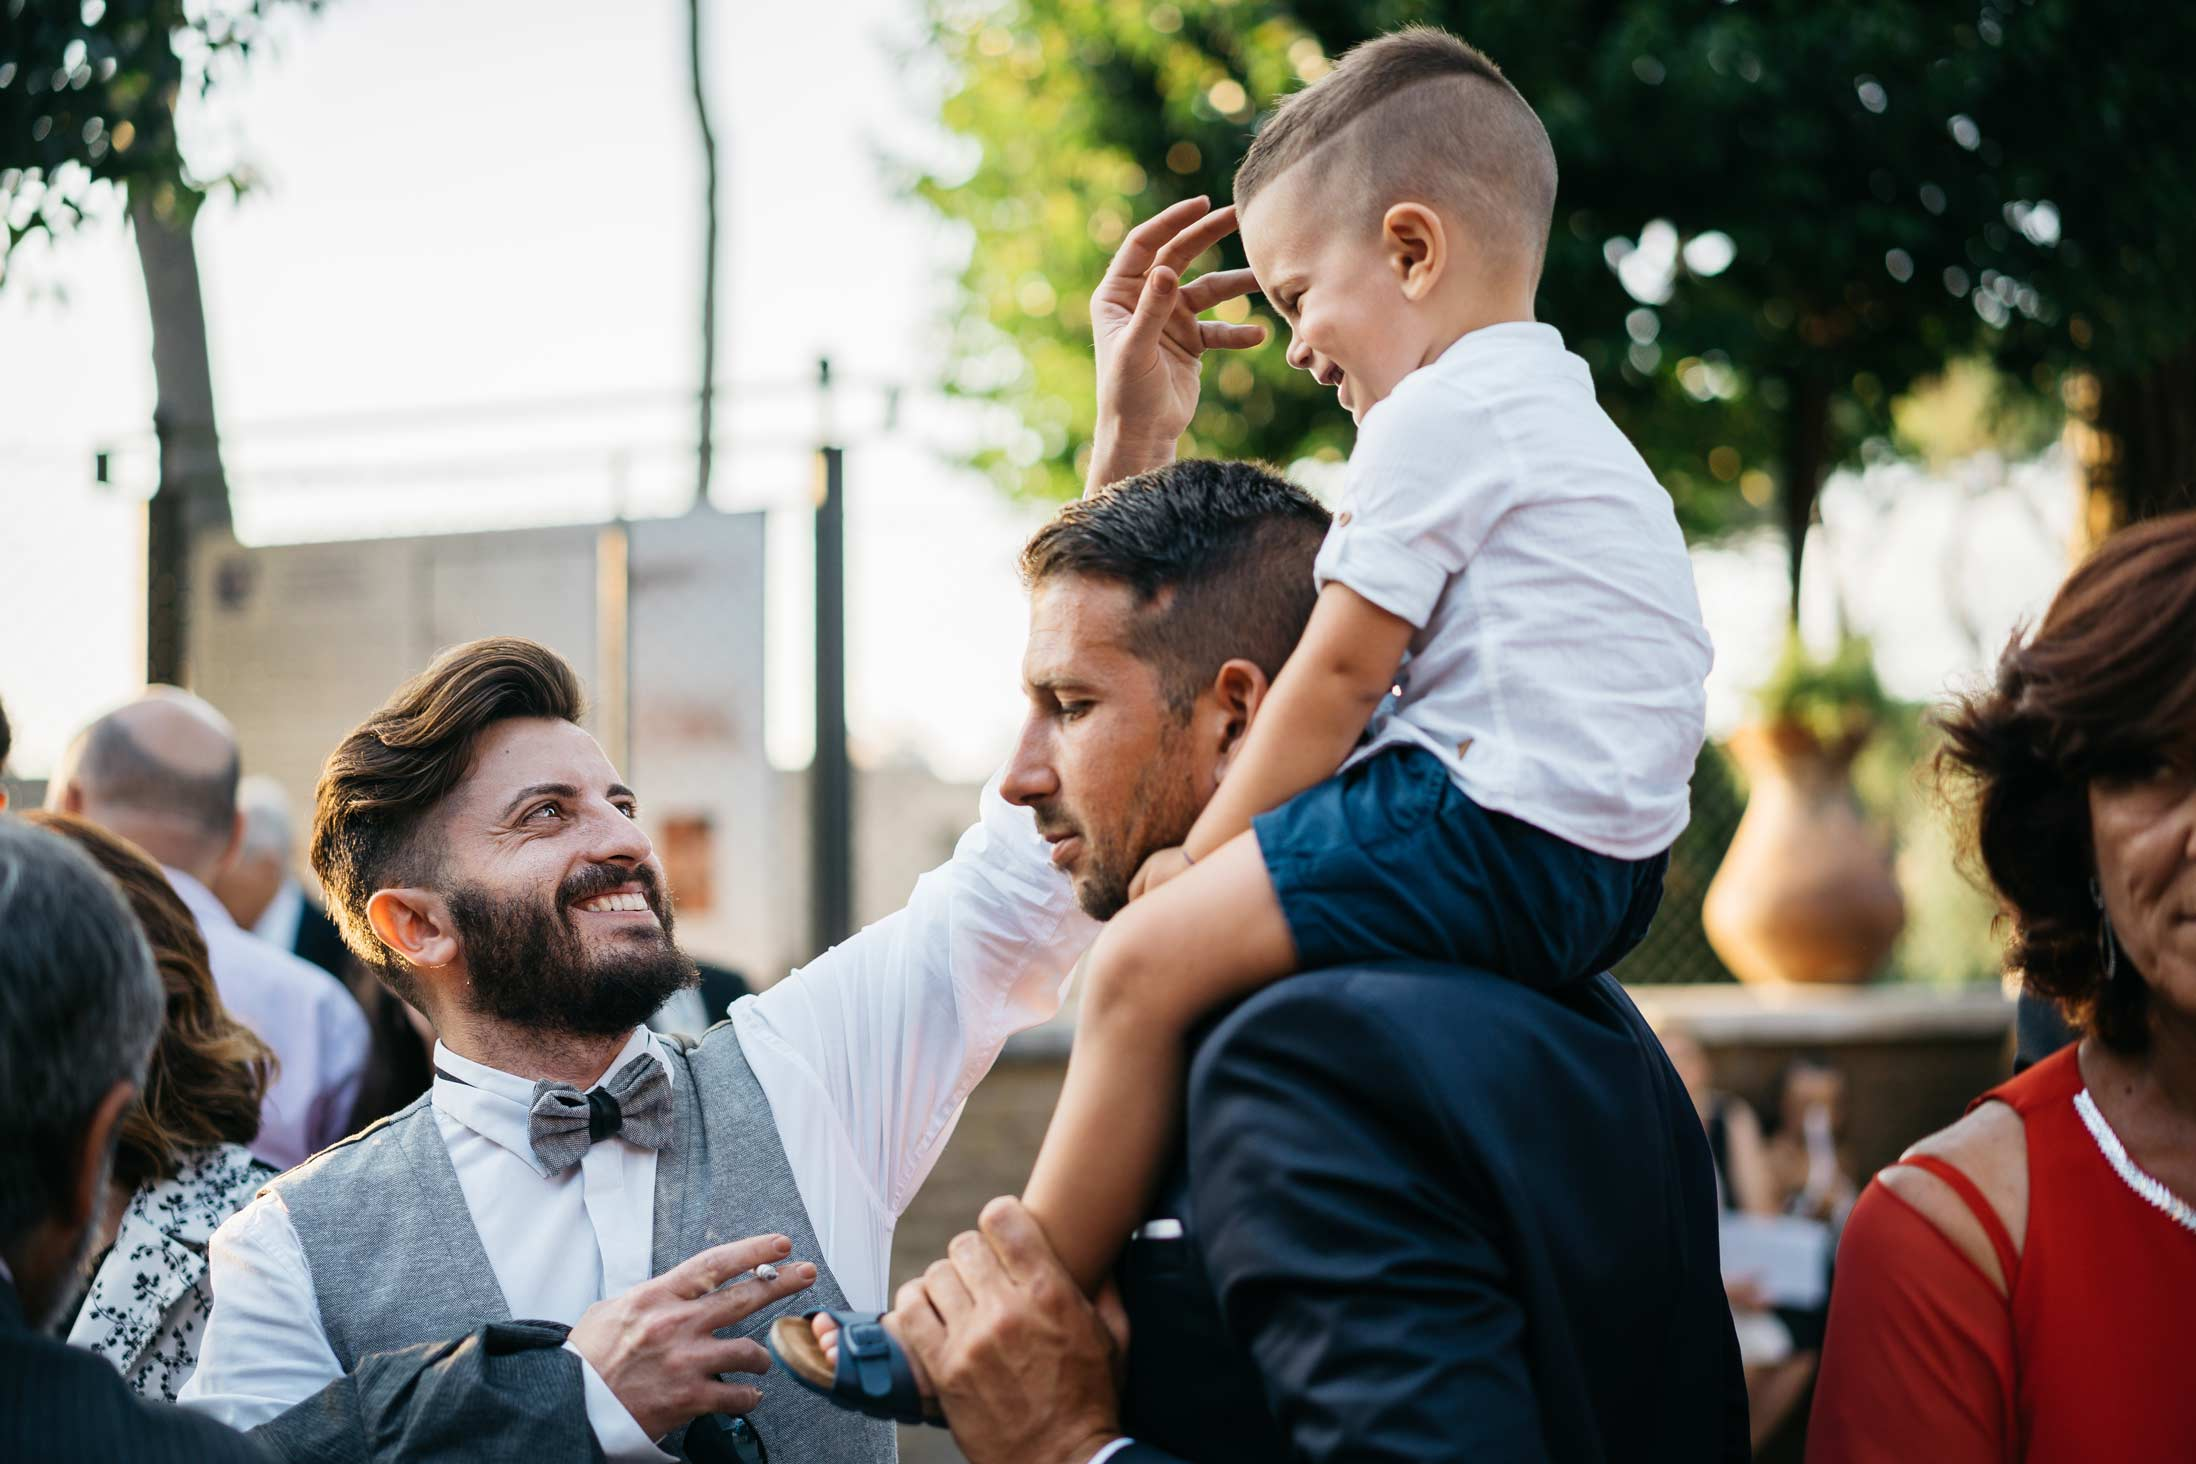 Destination-Wedding-Italy-Documentary-Wedding-Photography-1-Ceremony